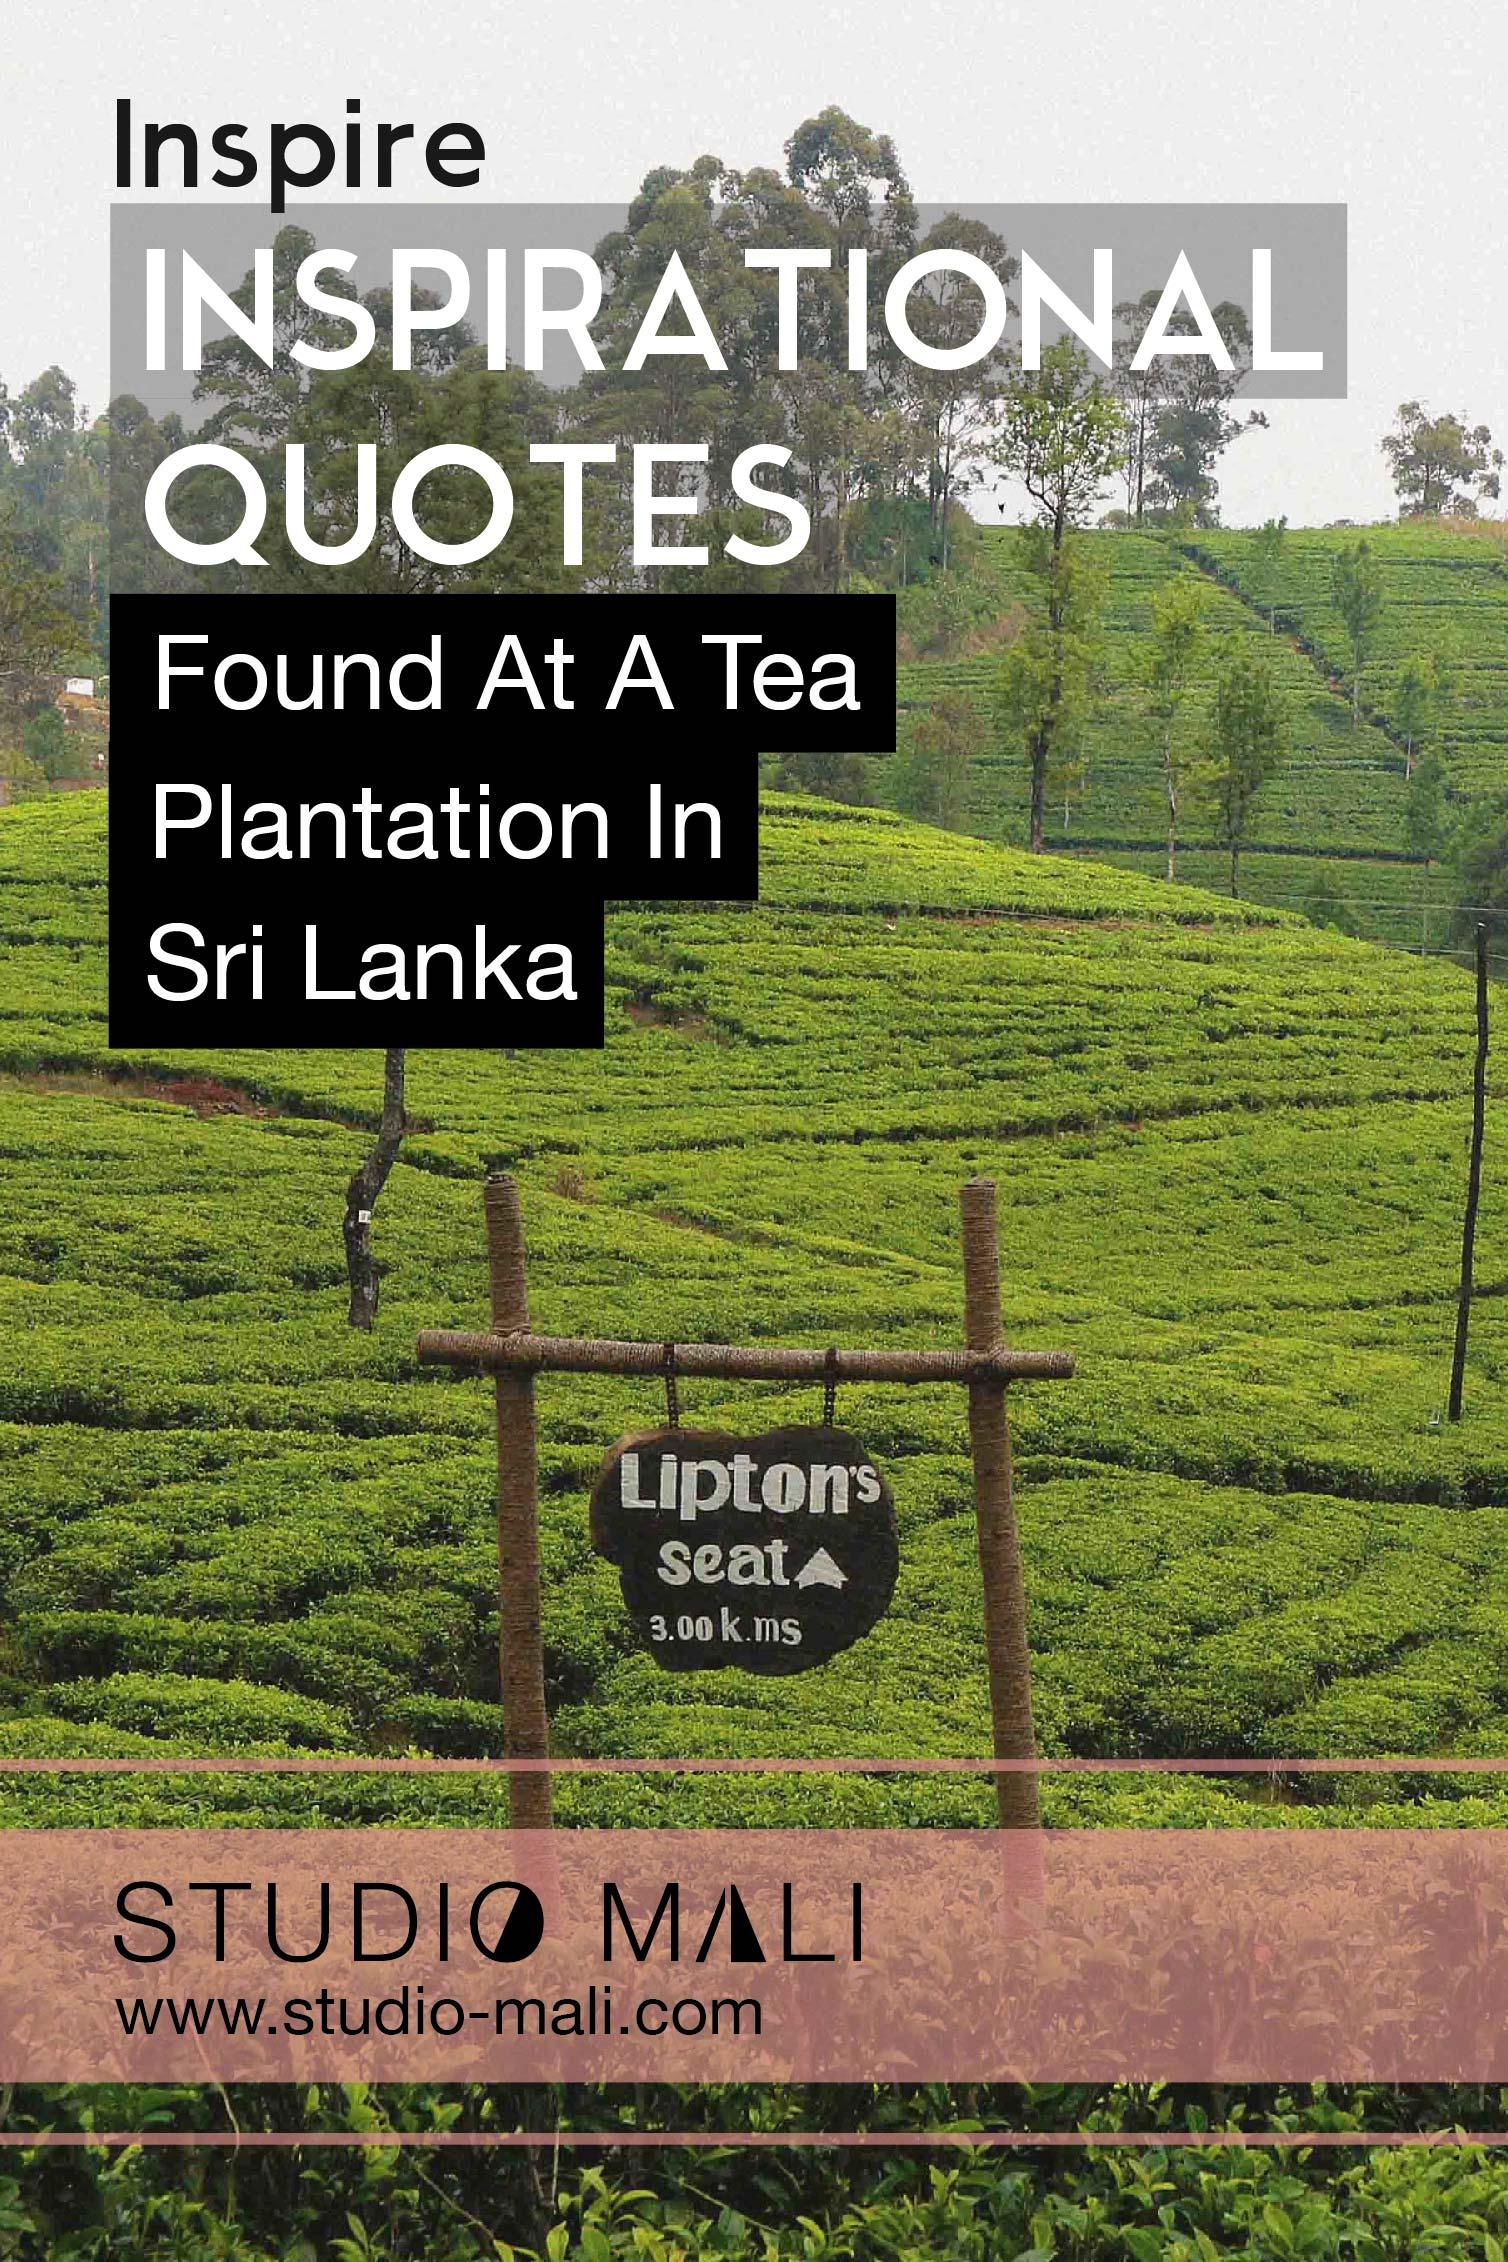 Inspirational Quotes Found At A Tea Plantation In Sri Lanka, by Studio Mali.jpg